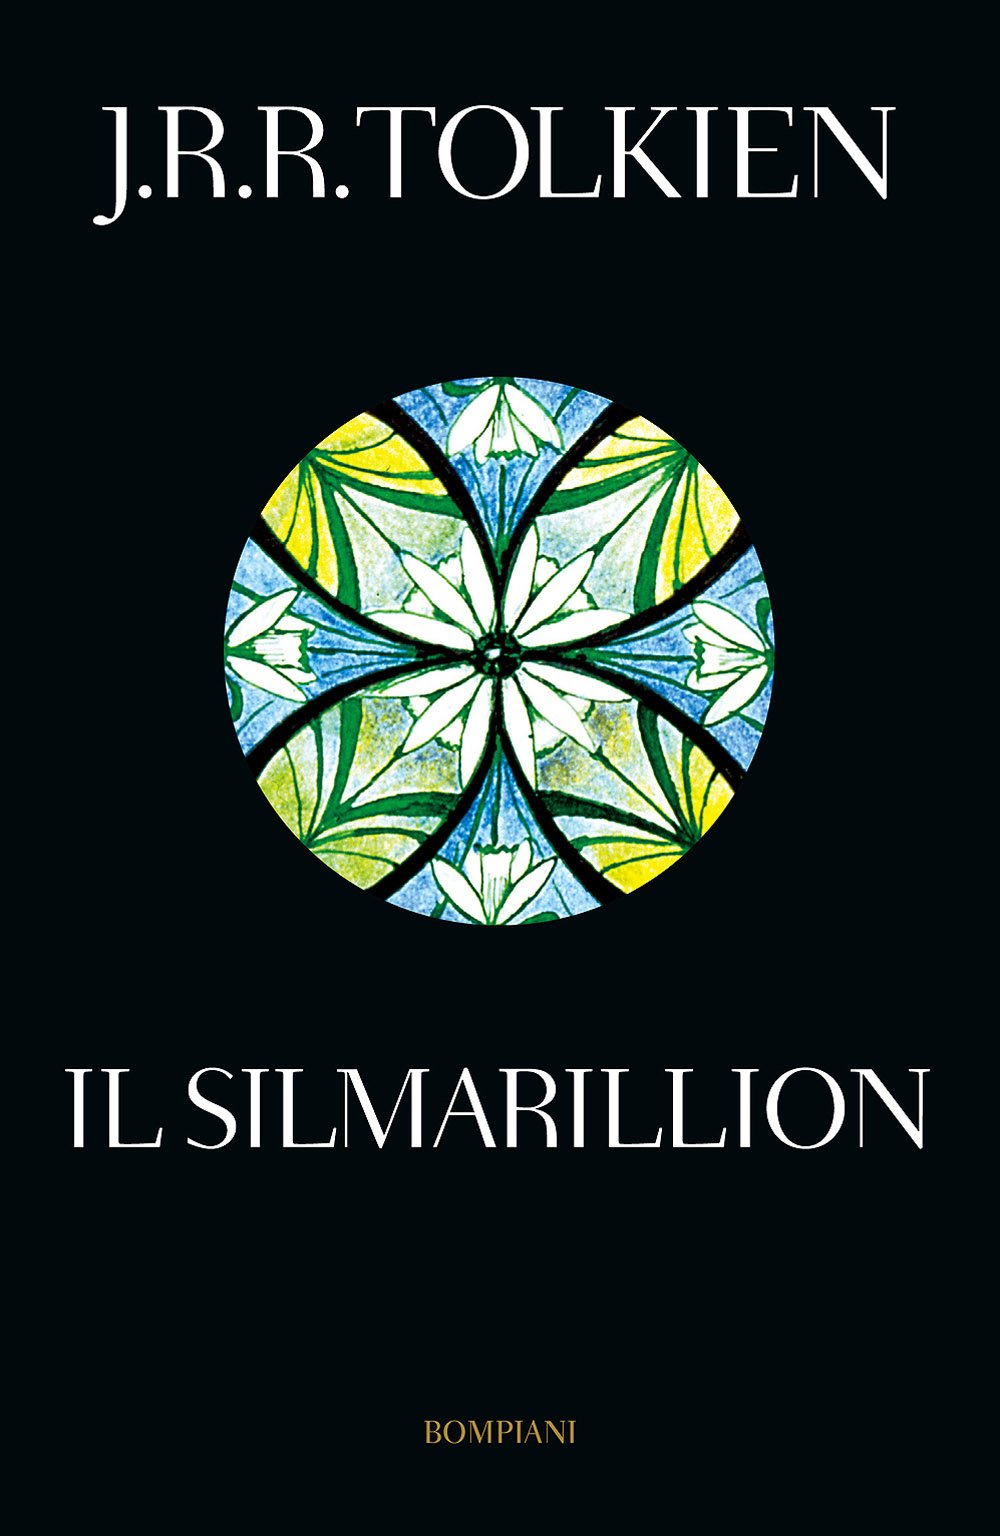 Il Silmarillion Copertina flessibile – 23 gen 2013 John R. R. Tolkien M. Respinti C. Tolkien F. Saba Sardi